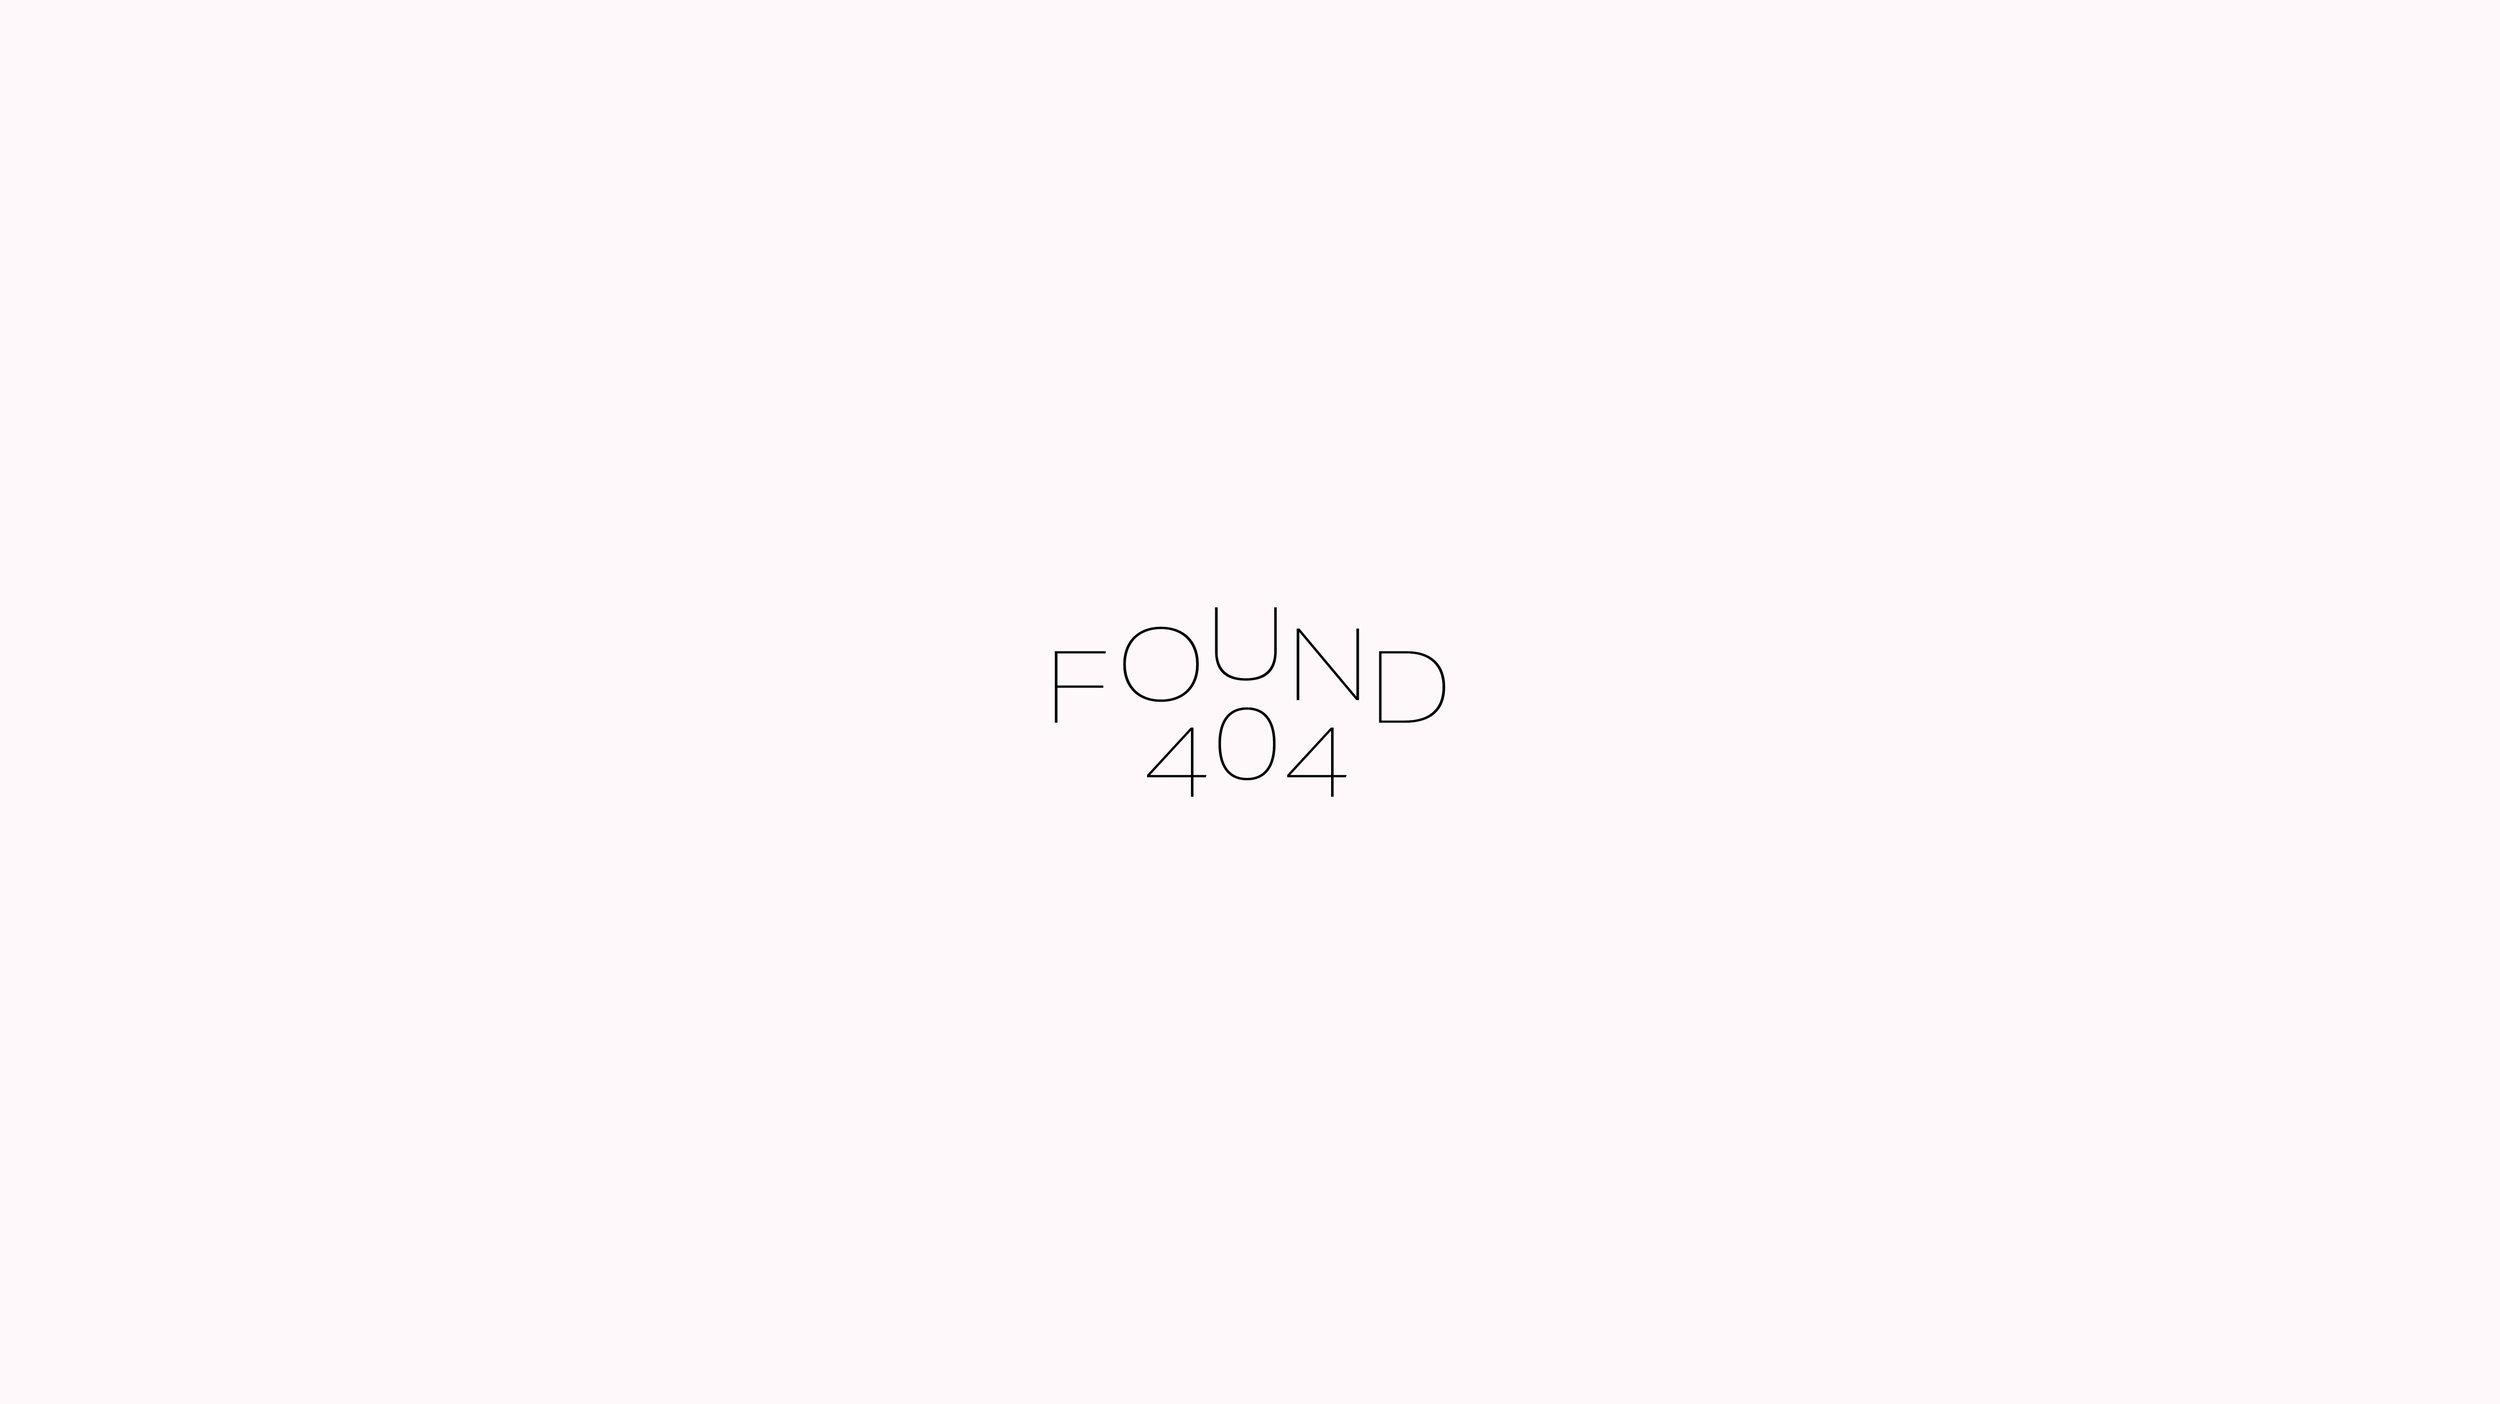 found404_masthead-01.jpg